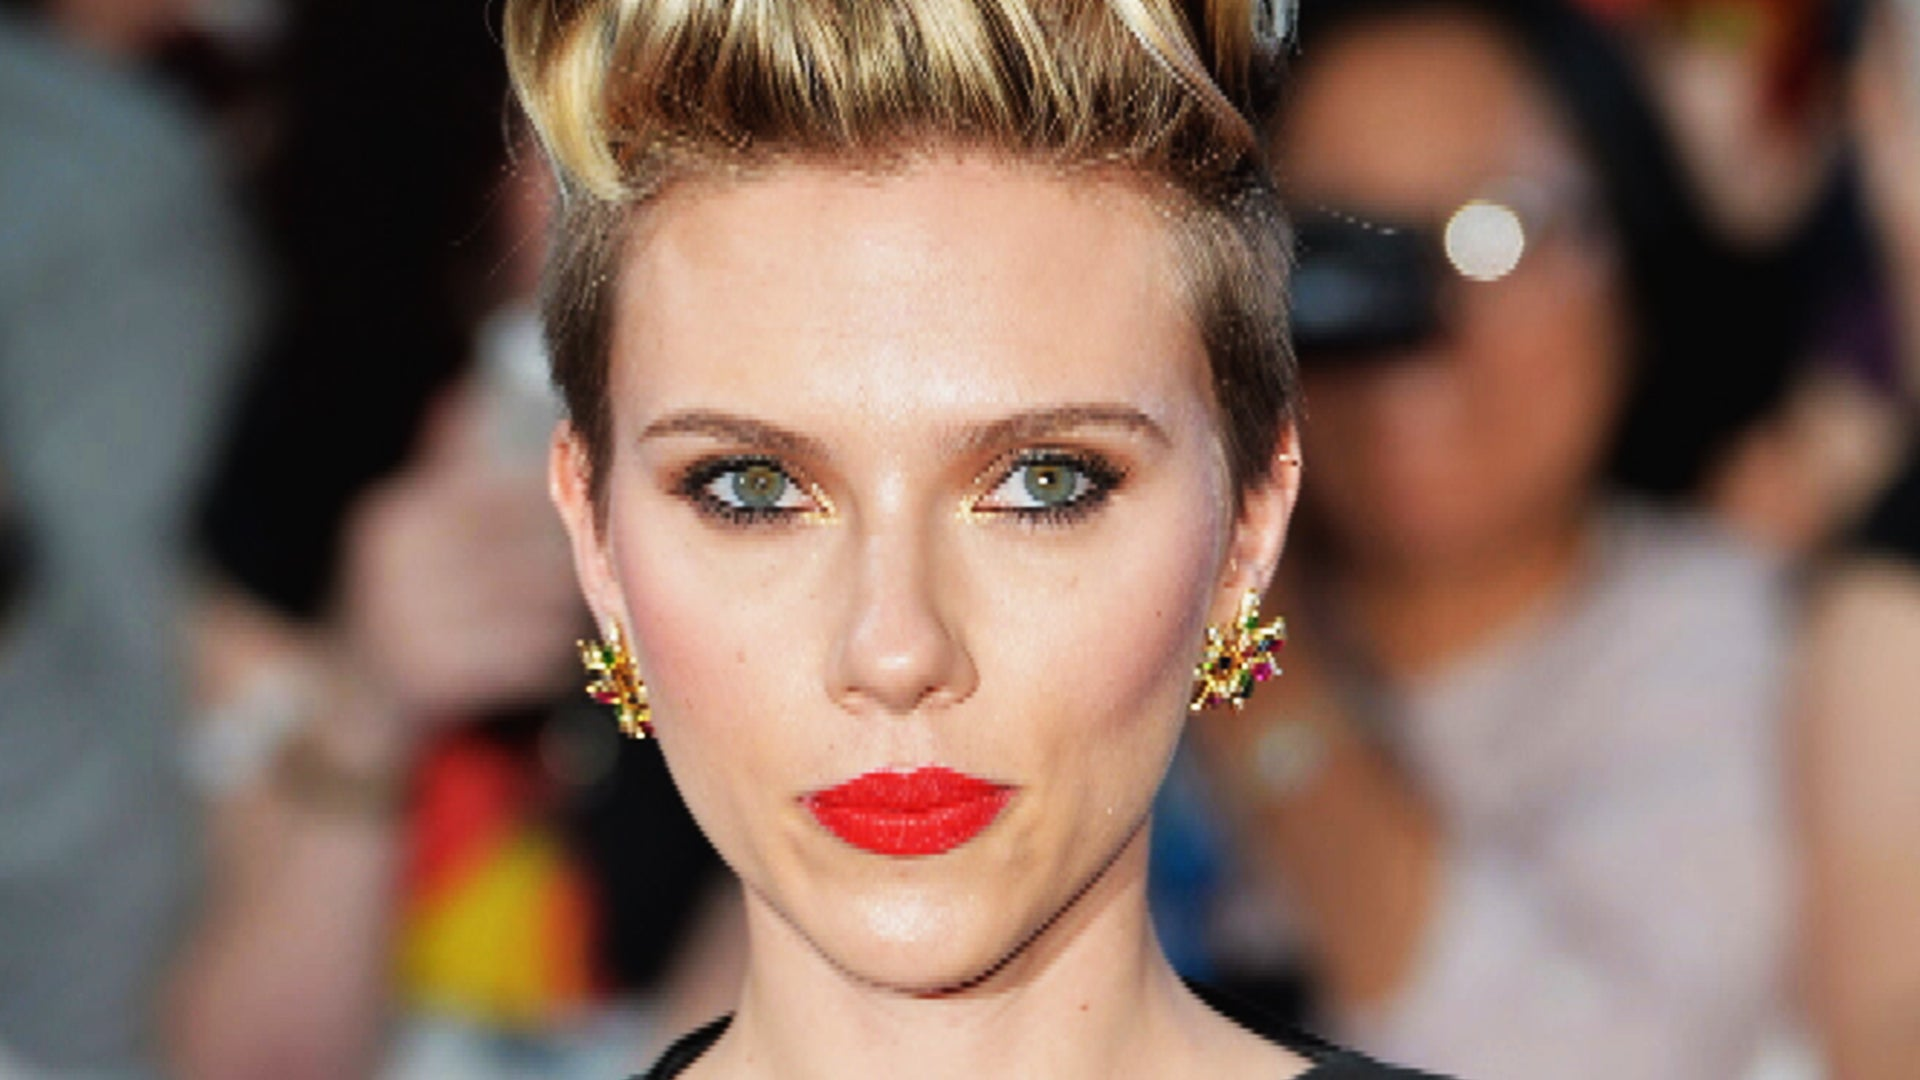 Scarlett Johansson Suing Disney Over 'Black Widow': Everything We Know